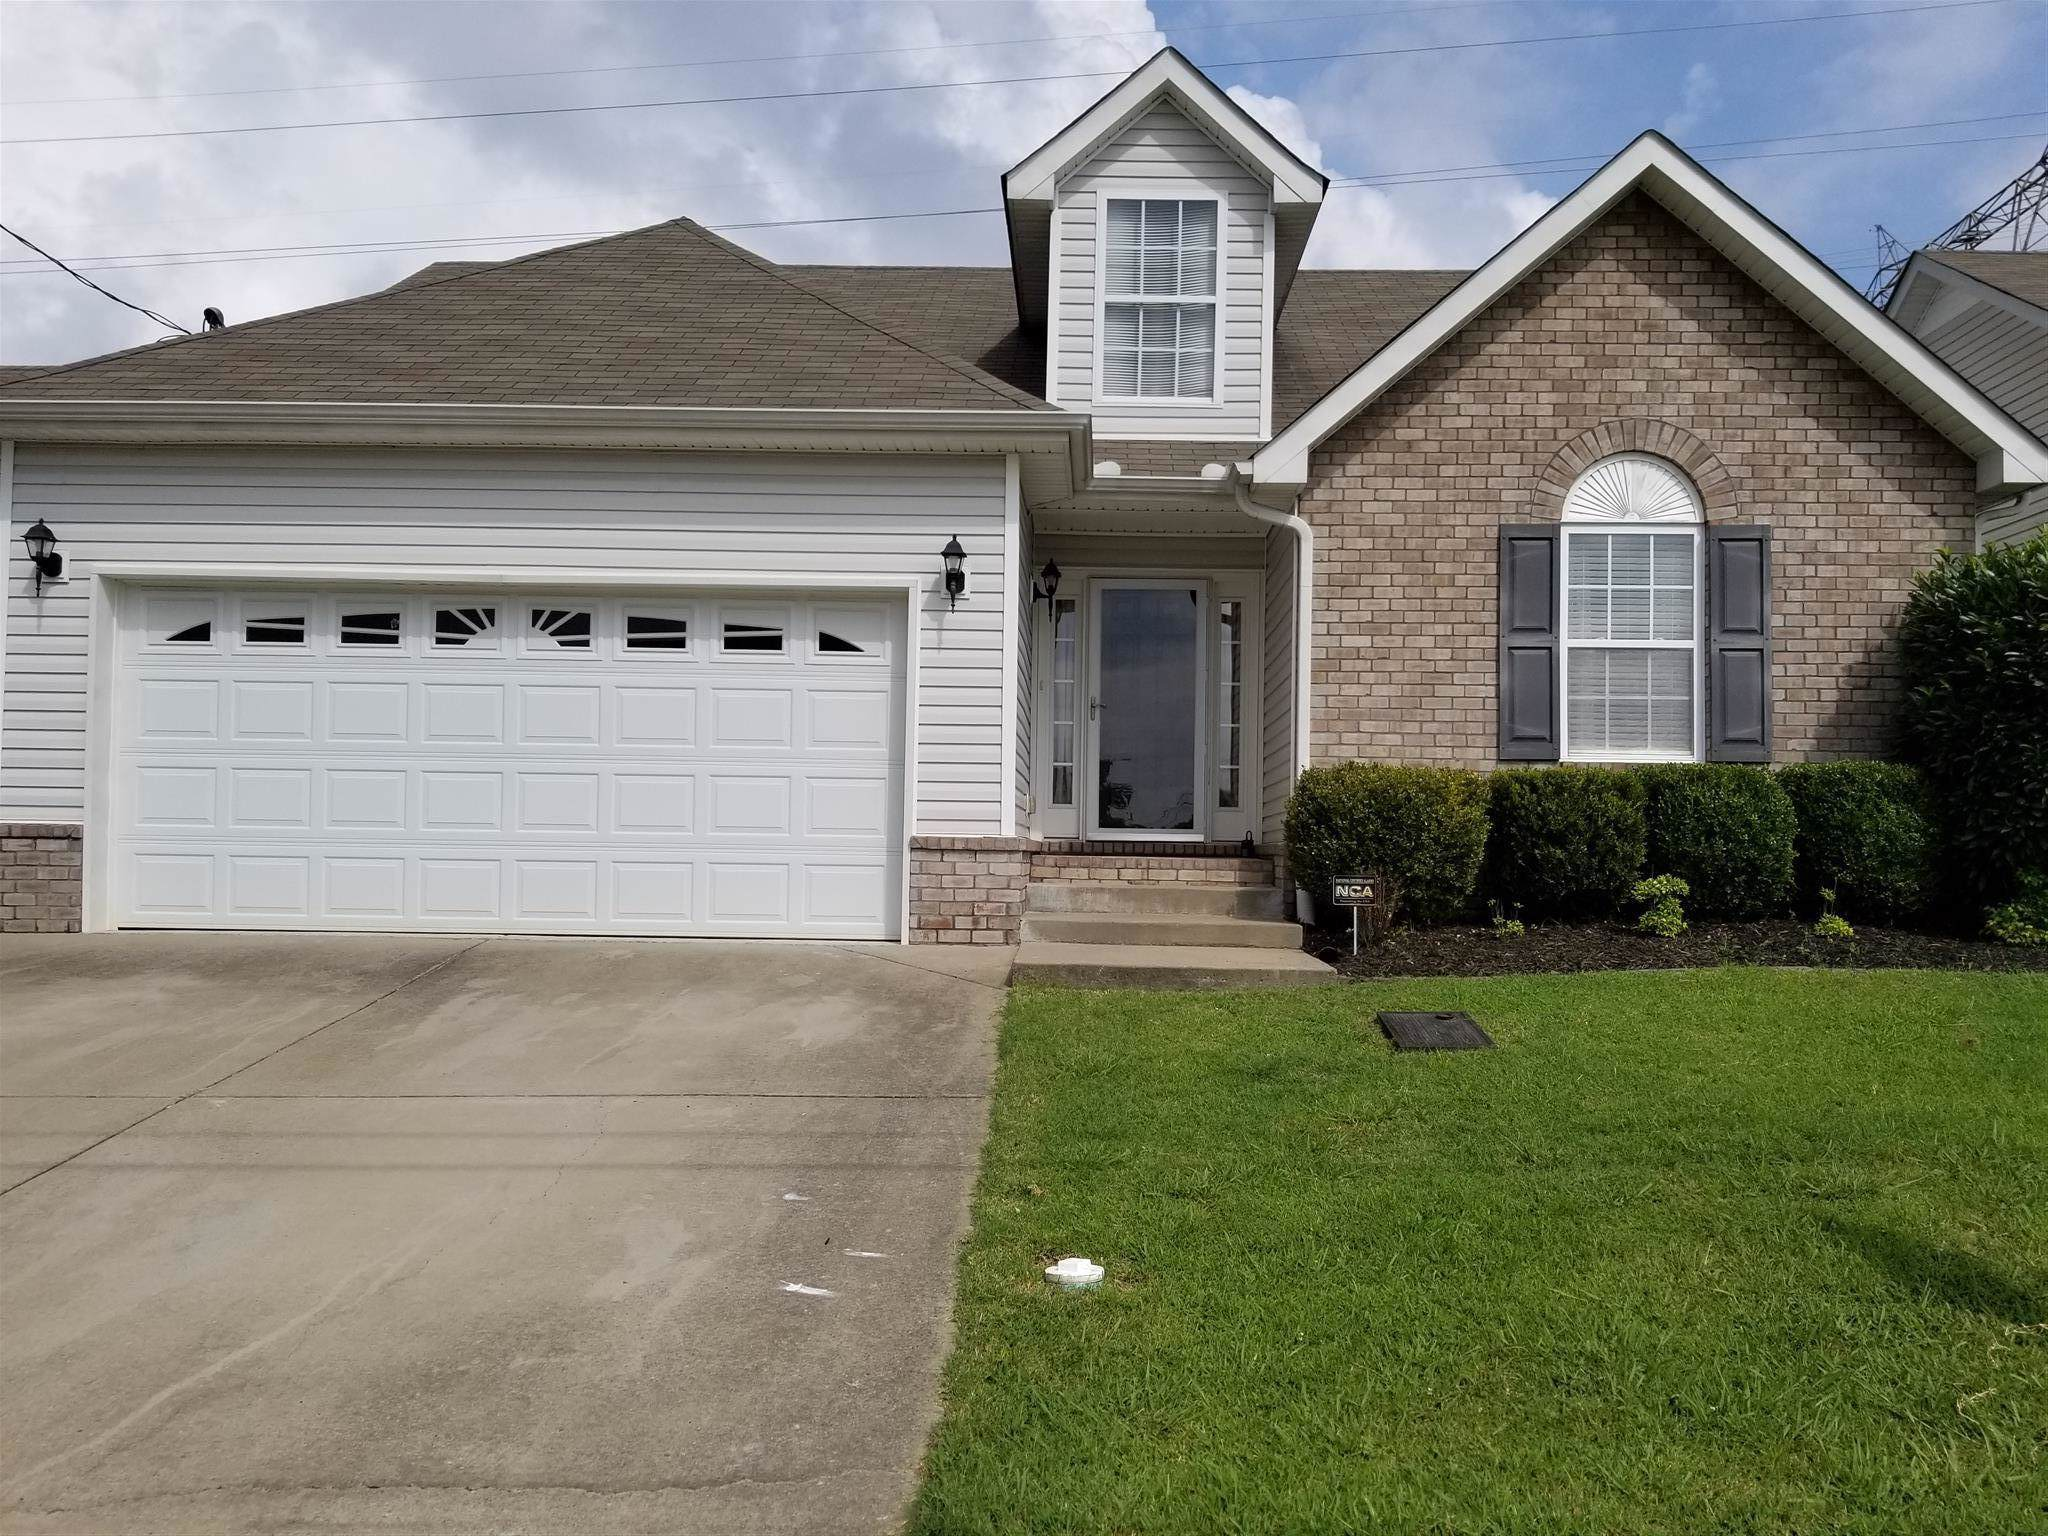 1245 Maritime Prt, Antioch, TN 37013 (MLS #RTC2062877) :: Berkshire Hathaway HomeServices Woodmont Realty